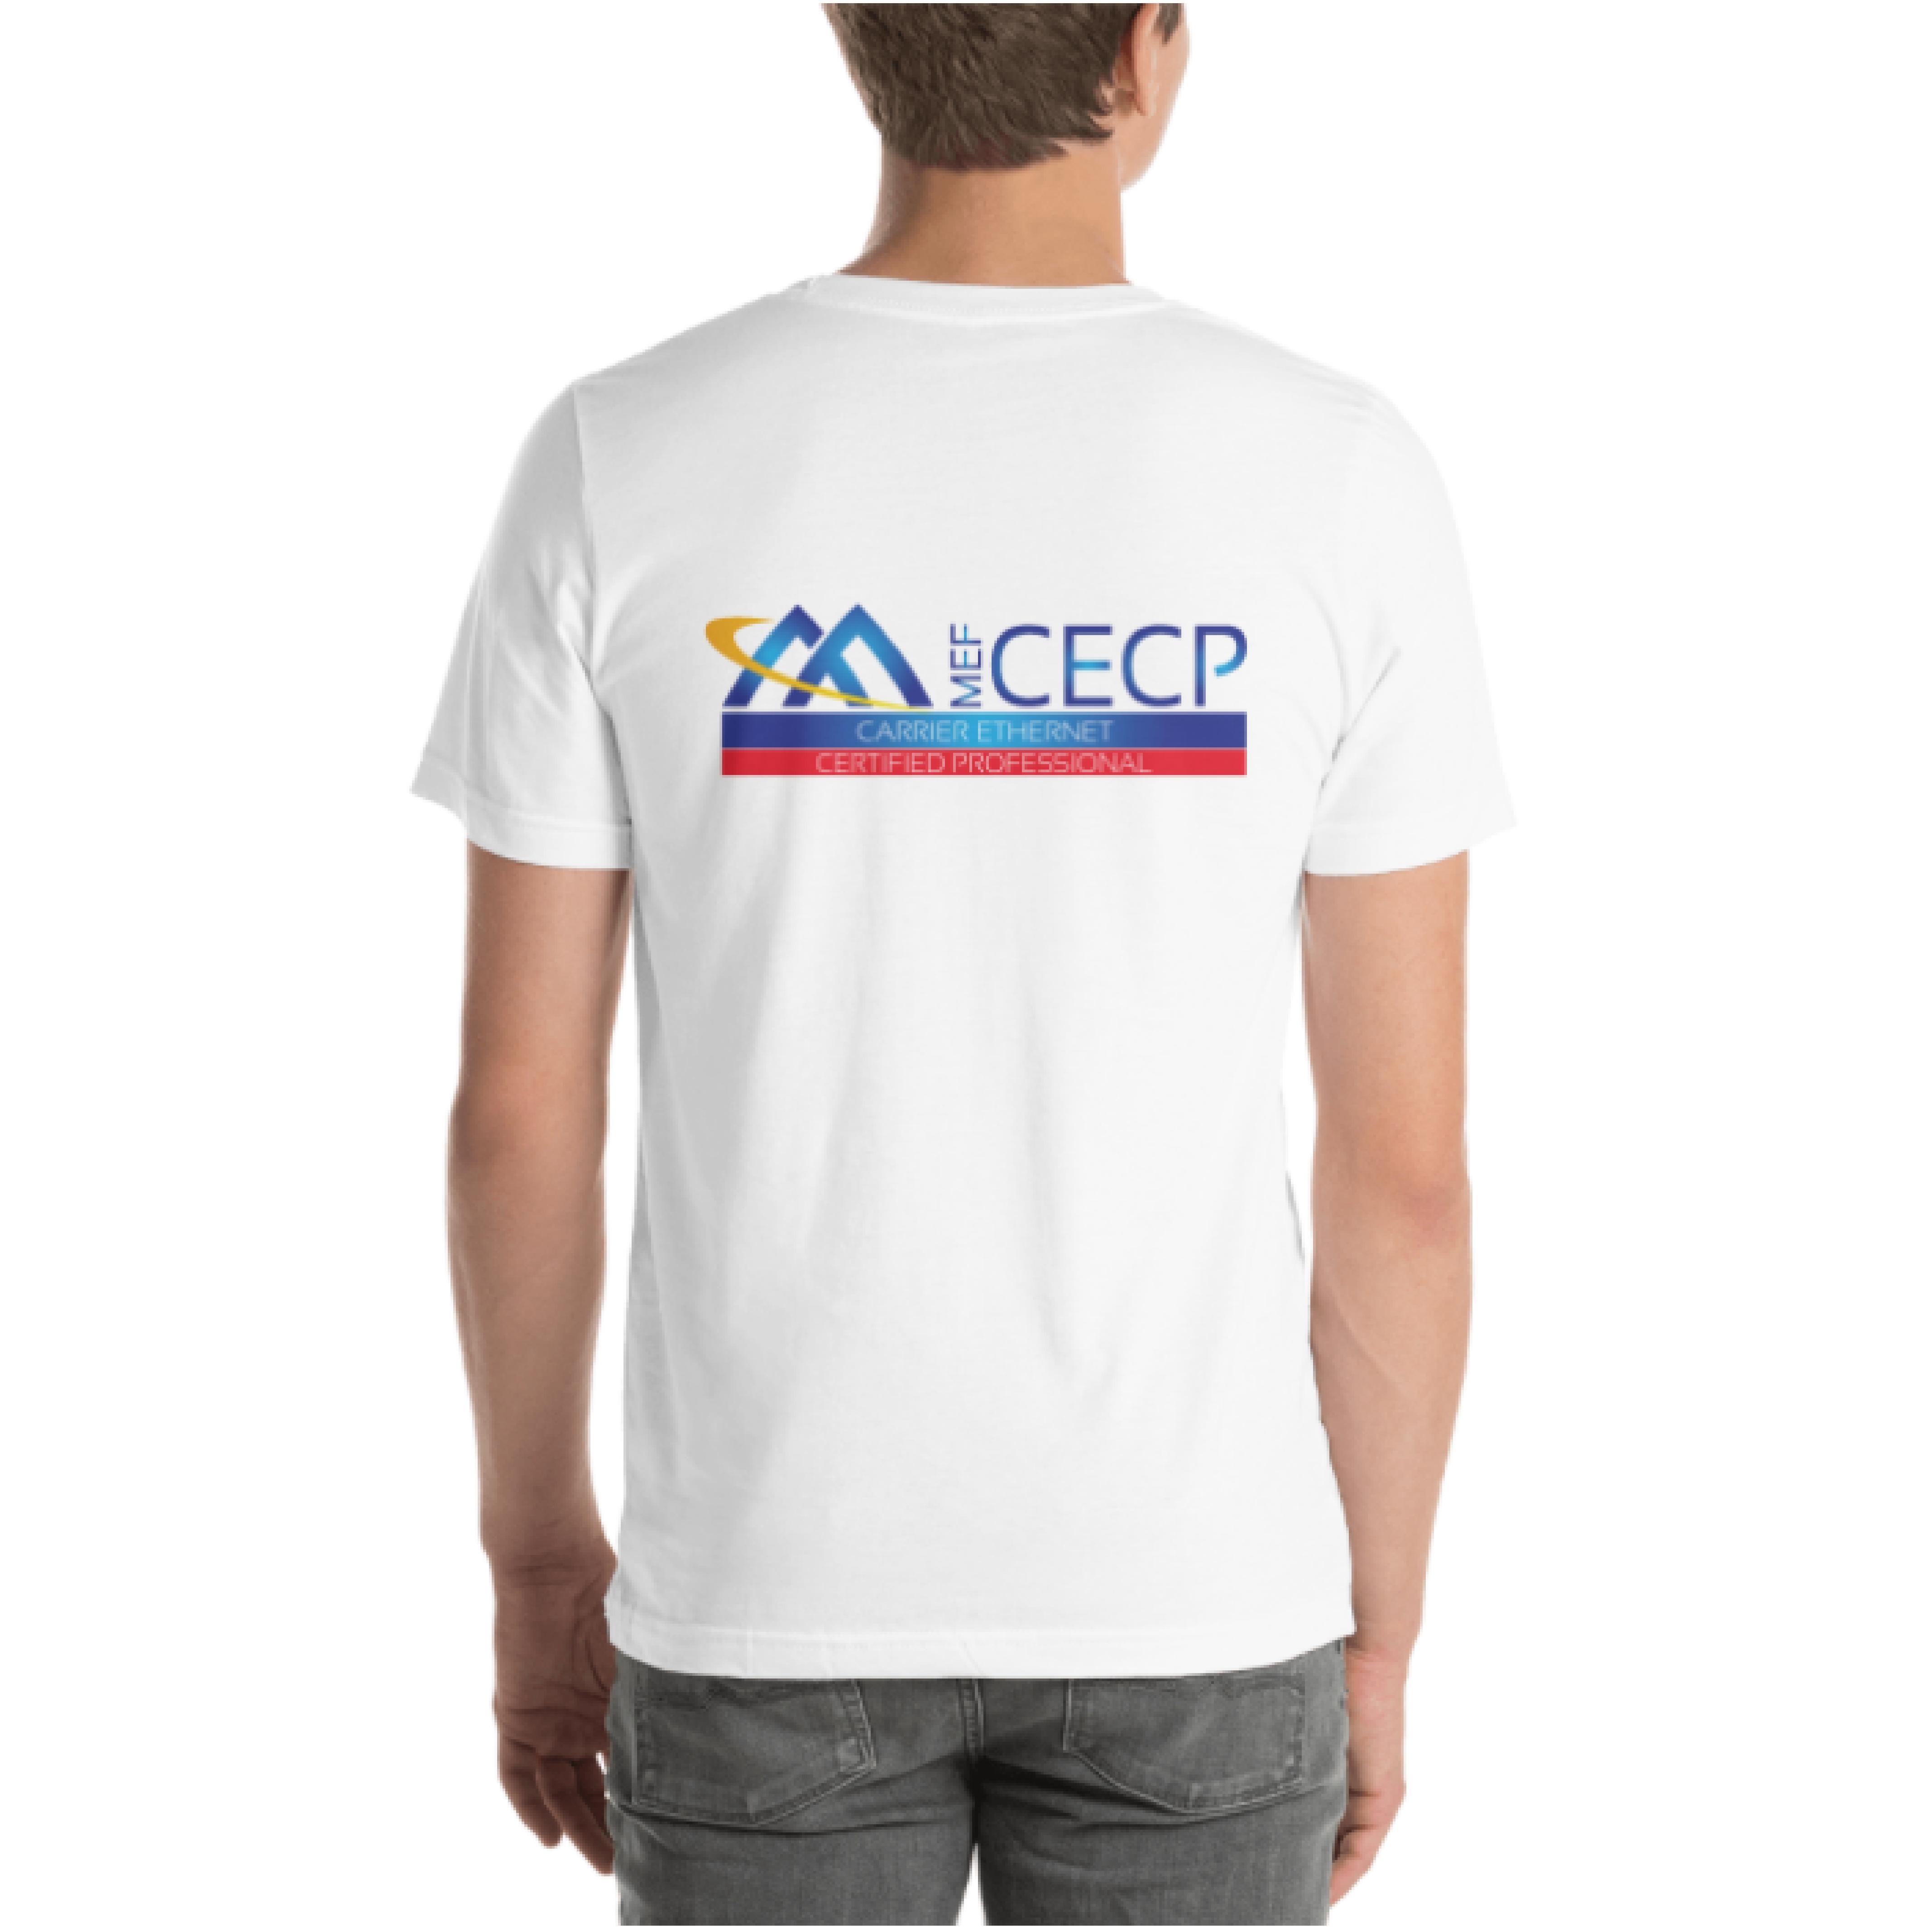 Mef cecp certified red short sleeve unisex t shirt t shirts mefcecpshortsleeveunisextshirtback1024x1024011521536787690 mefcecpshortsleeveunisextshirtash1024x1024011521447619553 malvernweather Choice Image